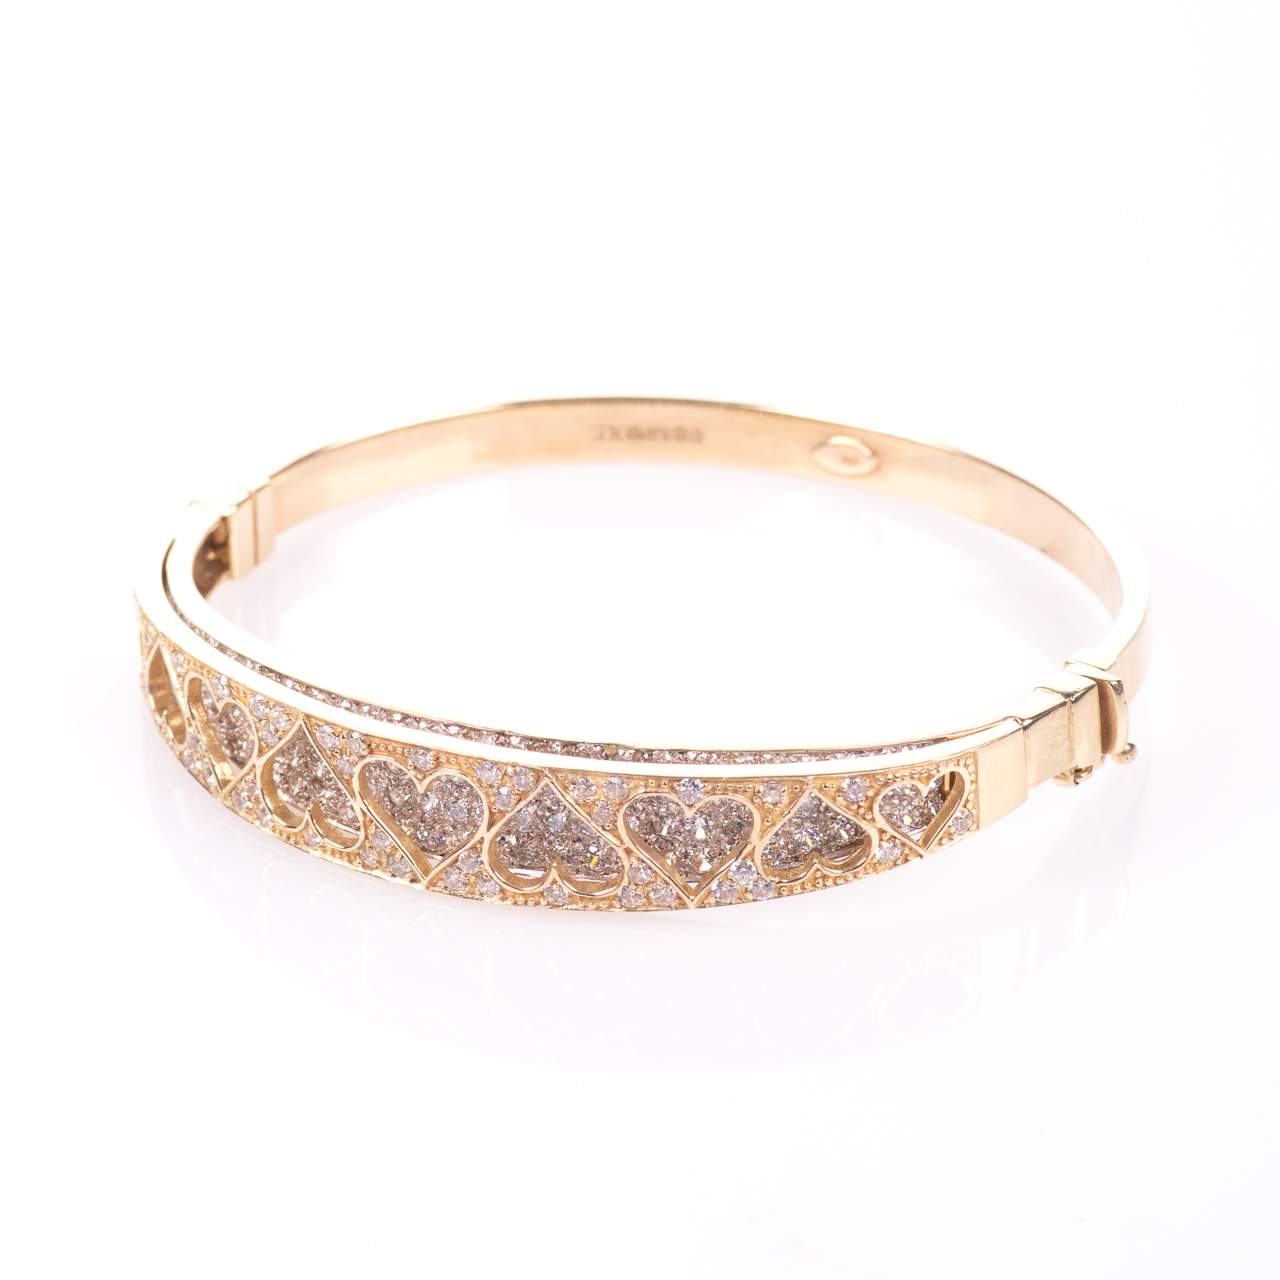 9ct Gold 4ct Diamond Heart Bangle Bracelet - Image 3 of 7